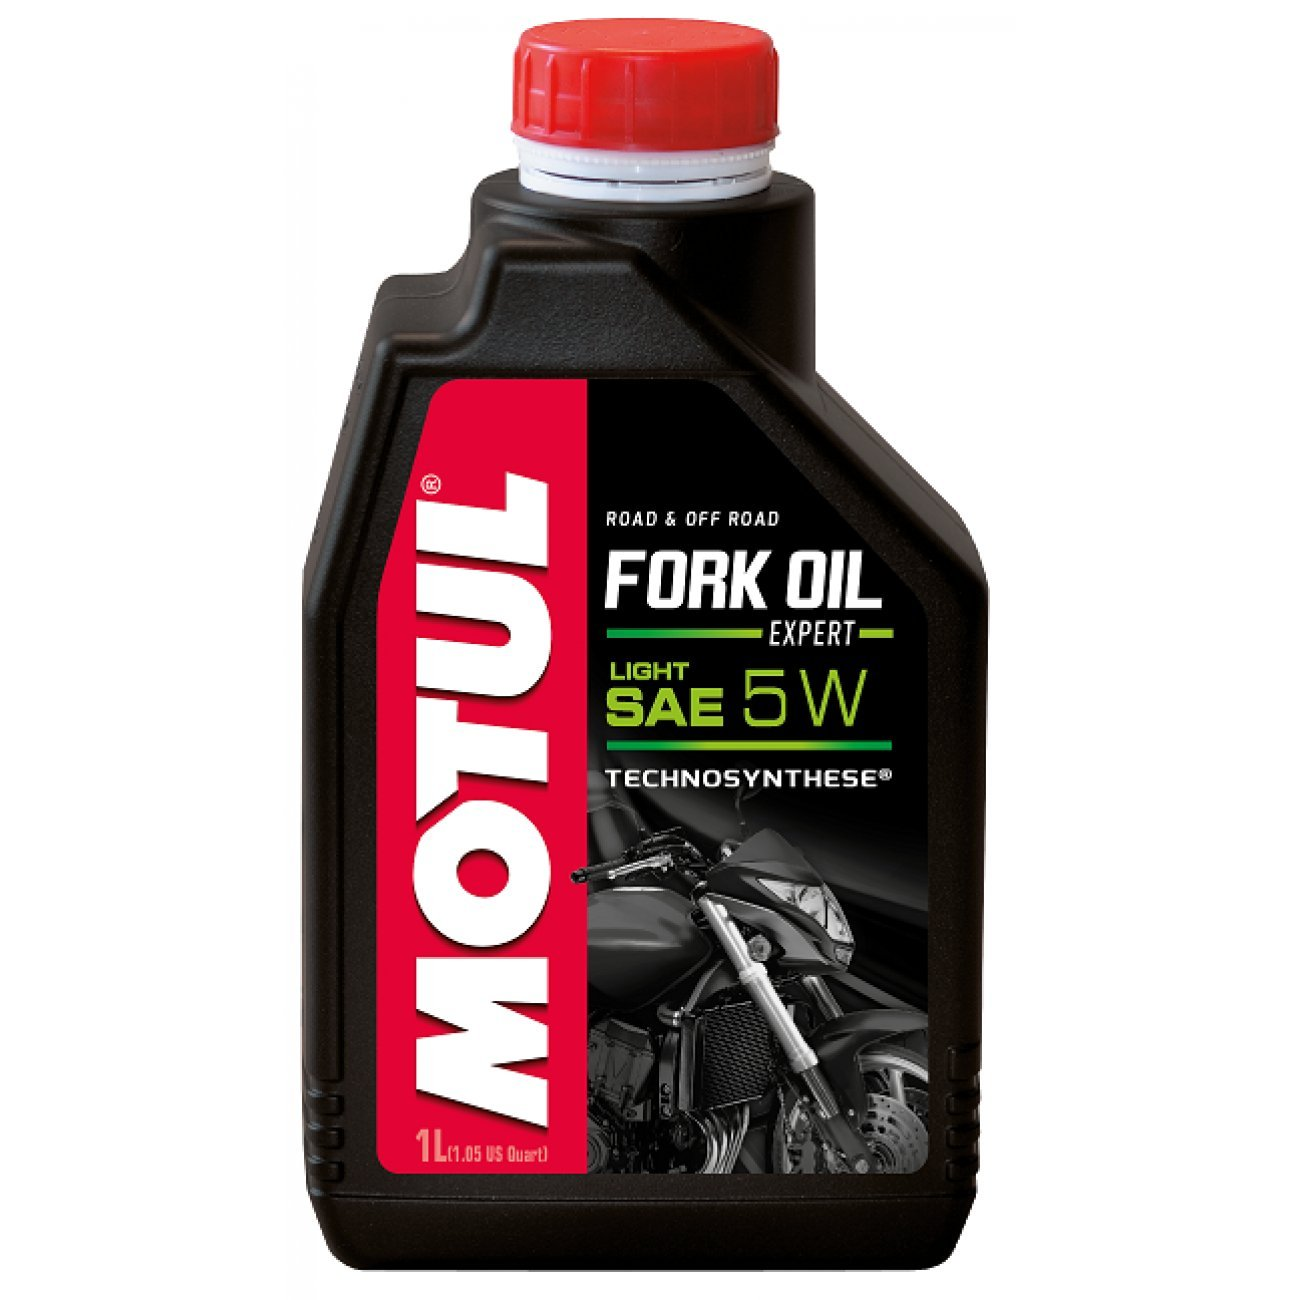 MOTUL - 105929 : Aceite de suspension FORK OIL EXPERT LIGHT 5W 1 L: Amazon.es: Coche y moto